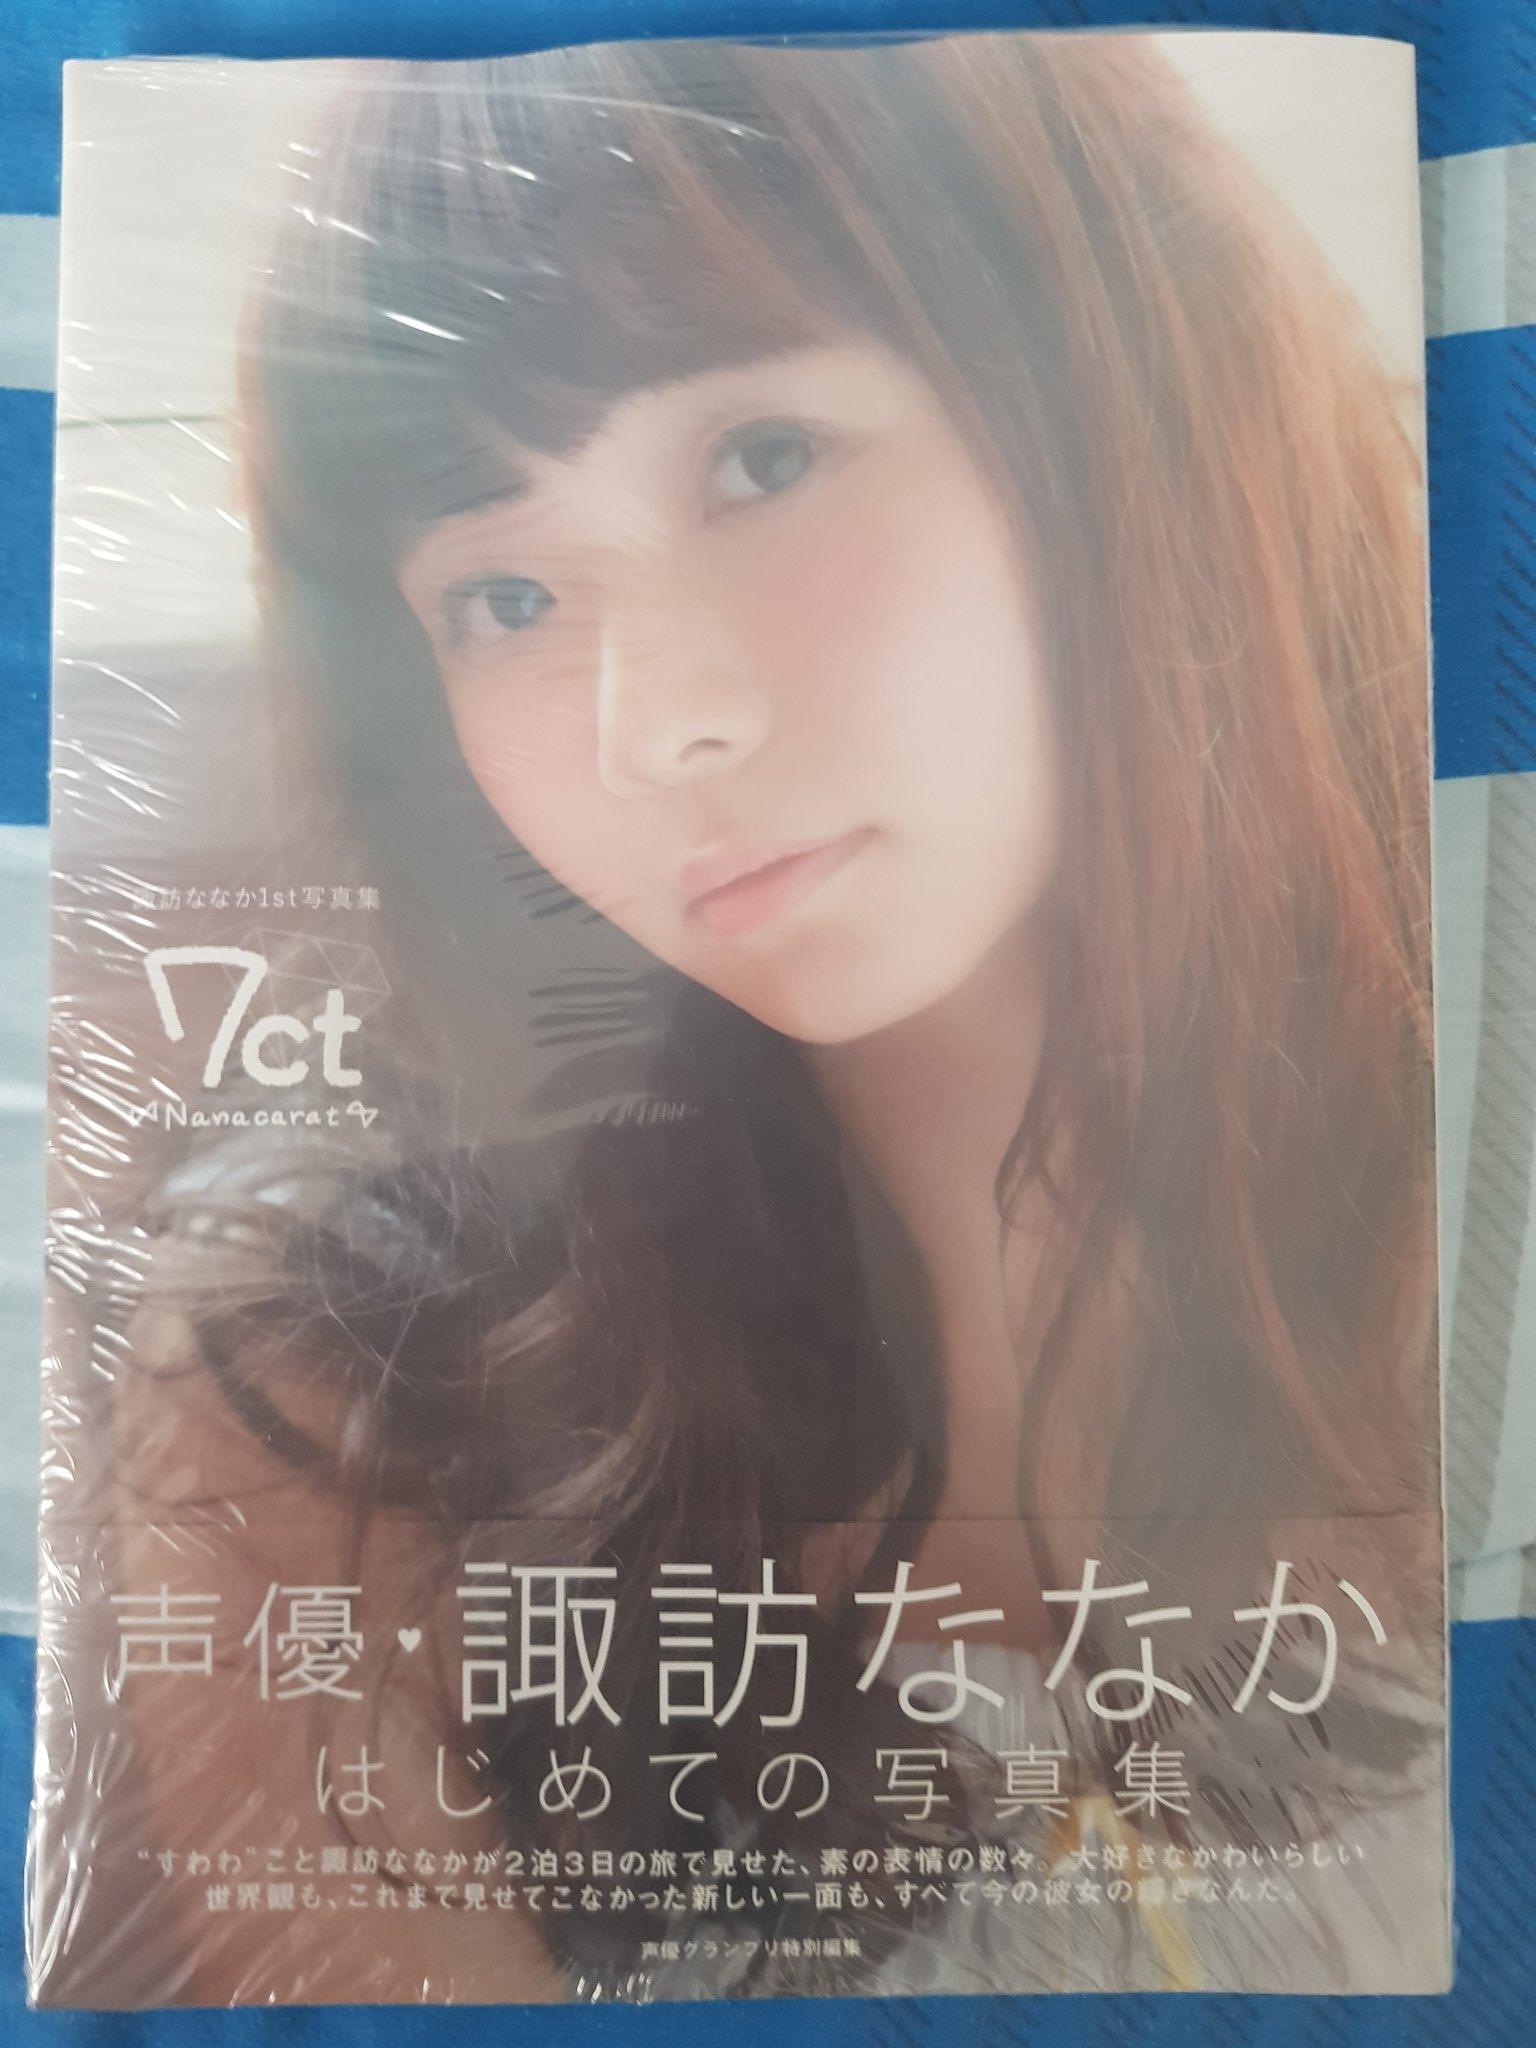 Suwawa photobook